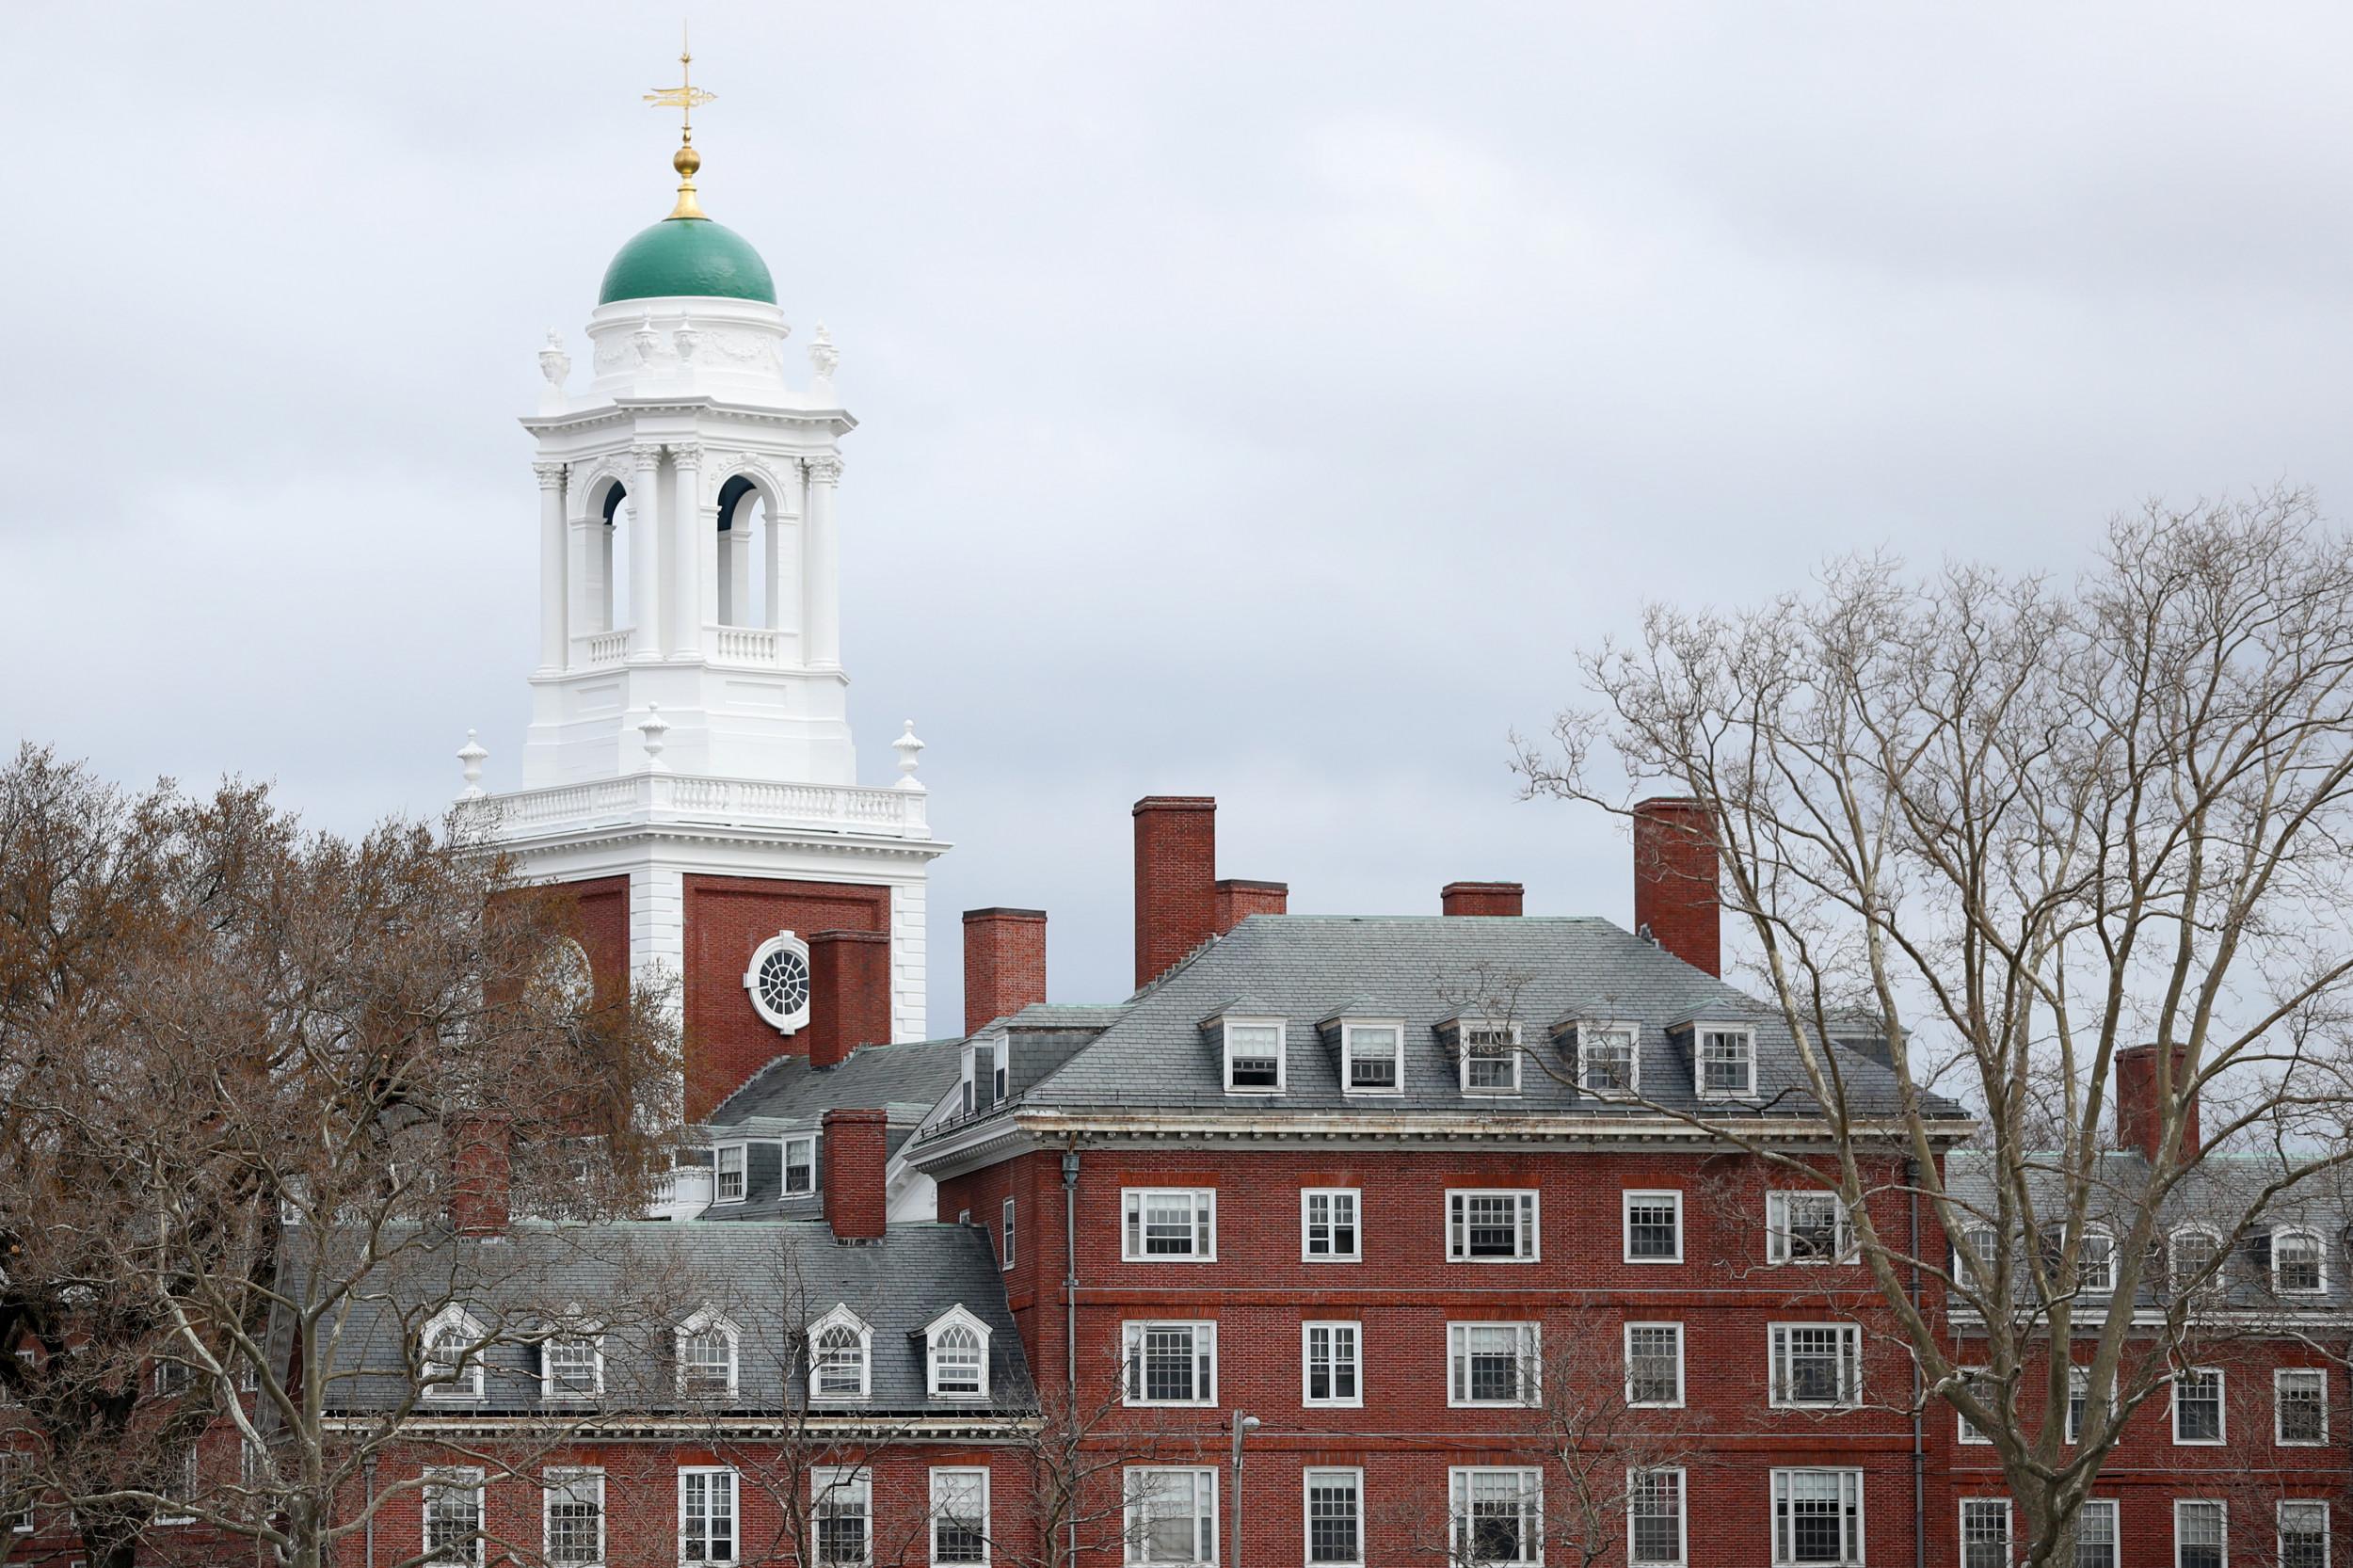 Harvard, With a $40 Billion Endowment, Will Receive $8.7 Million ...